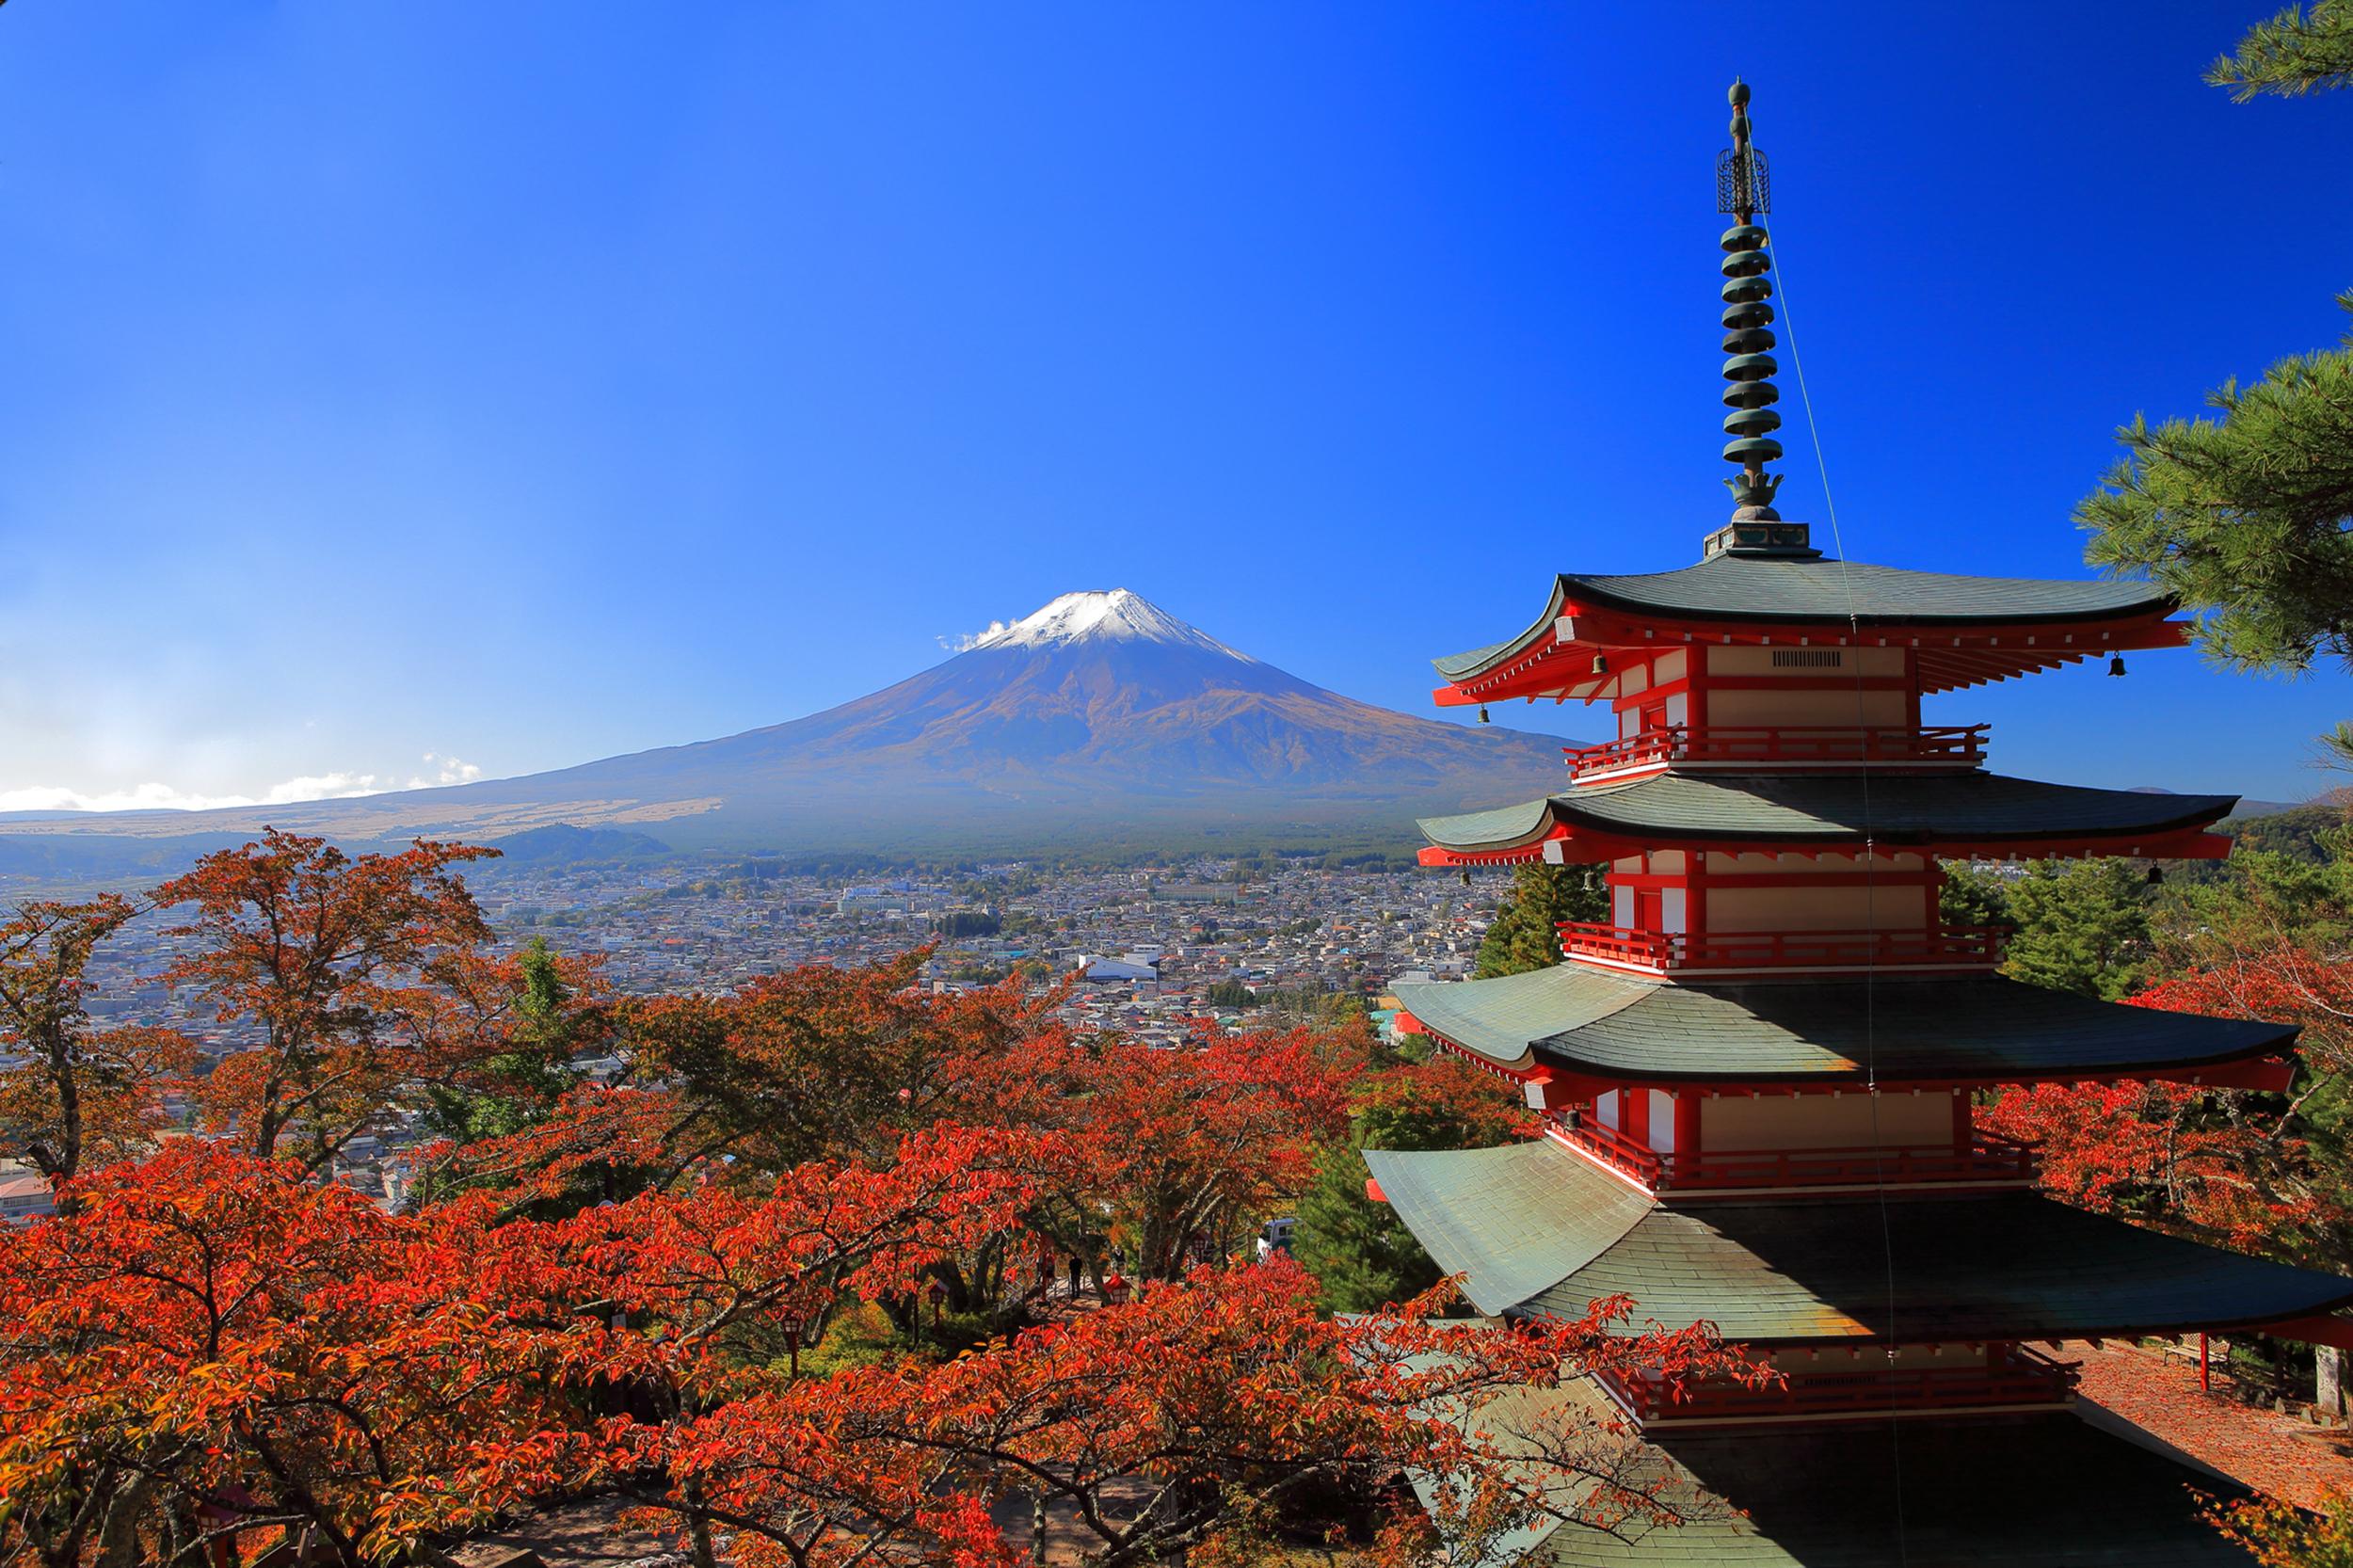 Mt Fuji, Chureito Pagoda